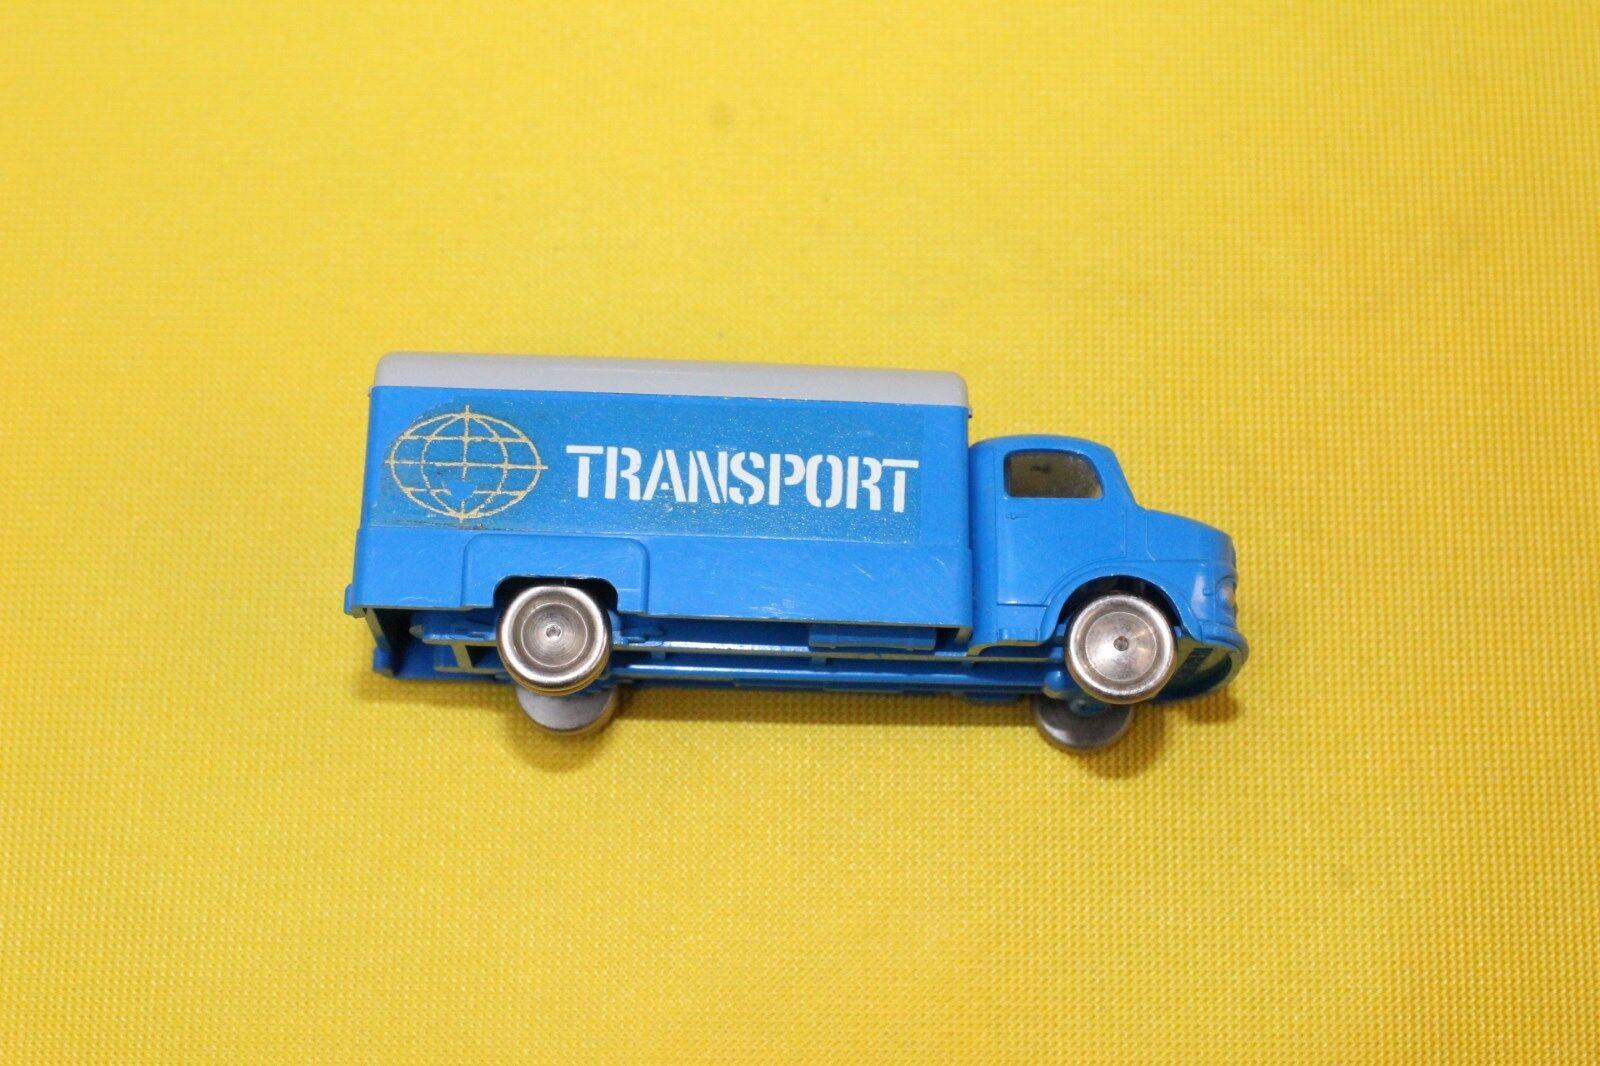 LEGO azul  Mercedes truck 651 with transport  sticker  Abziehbild